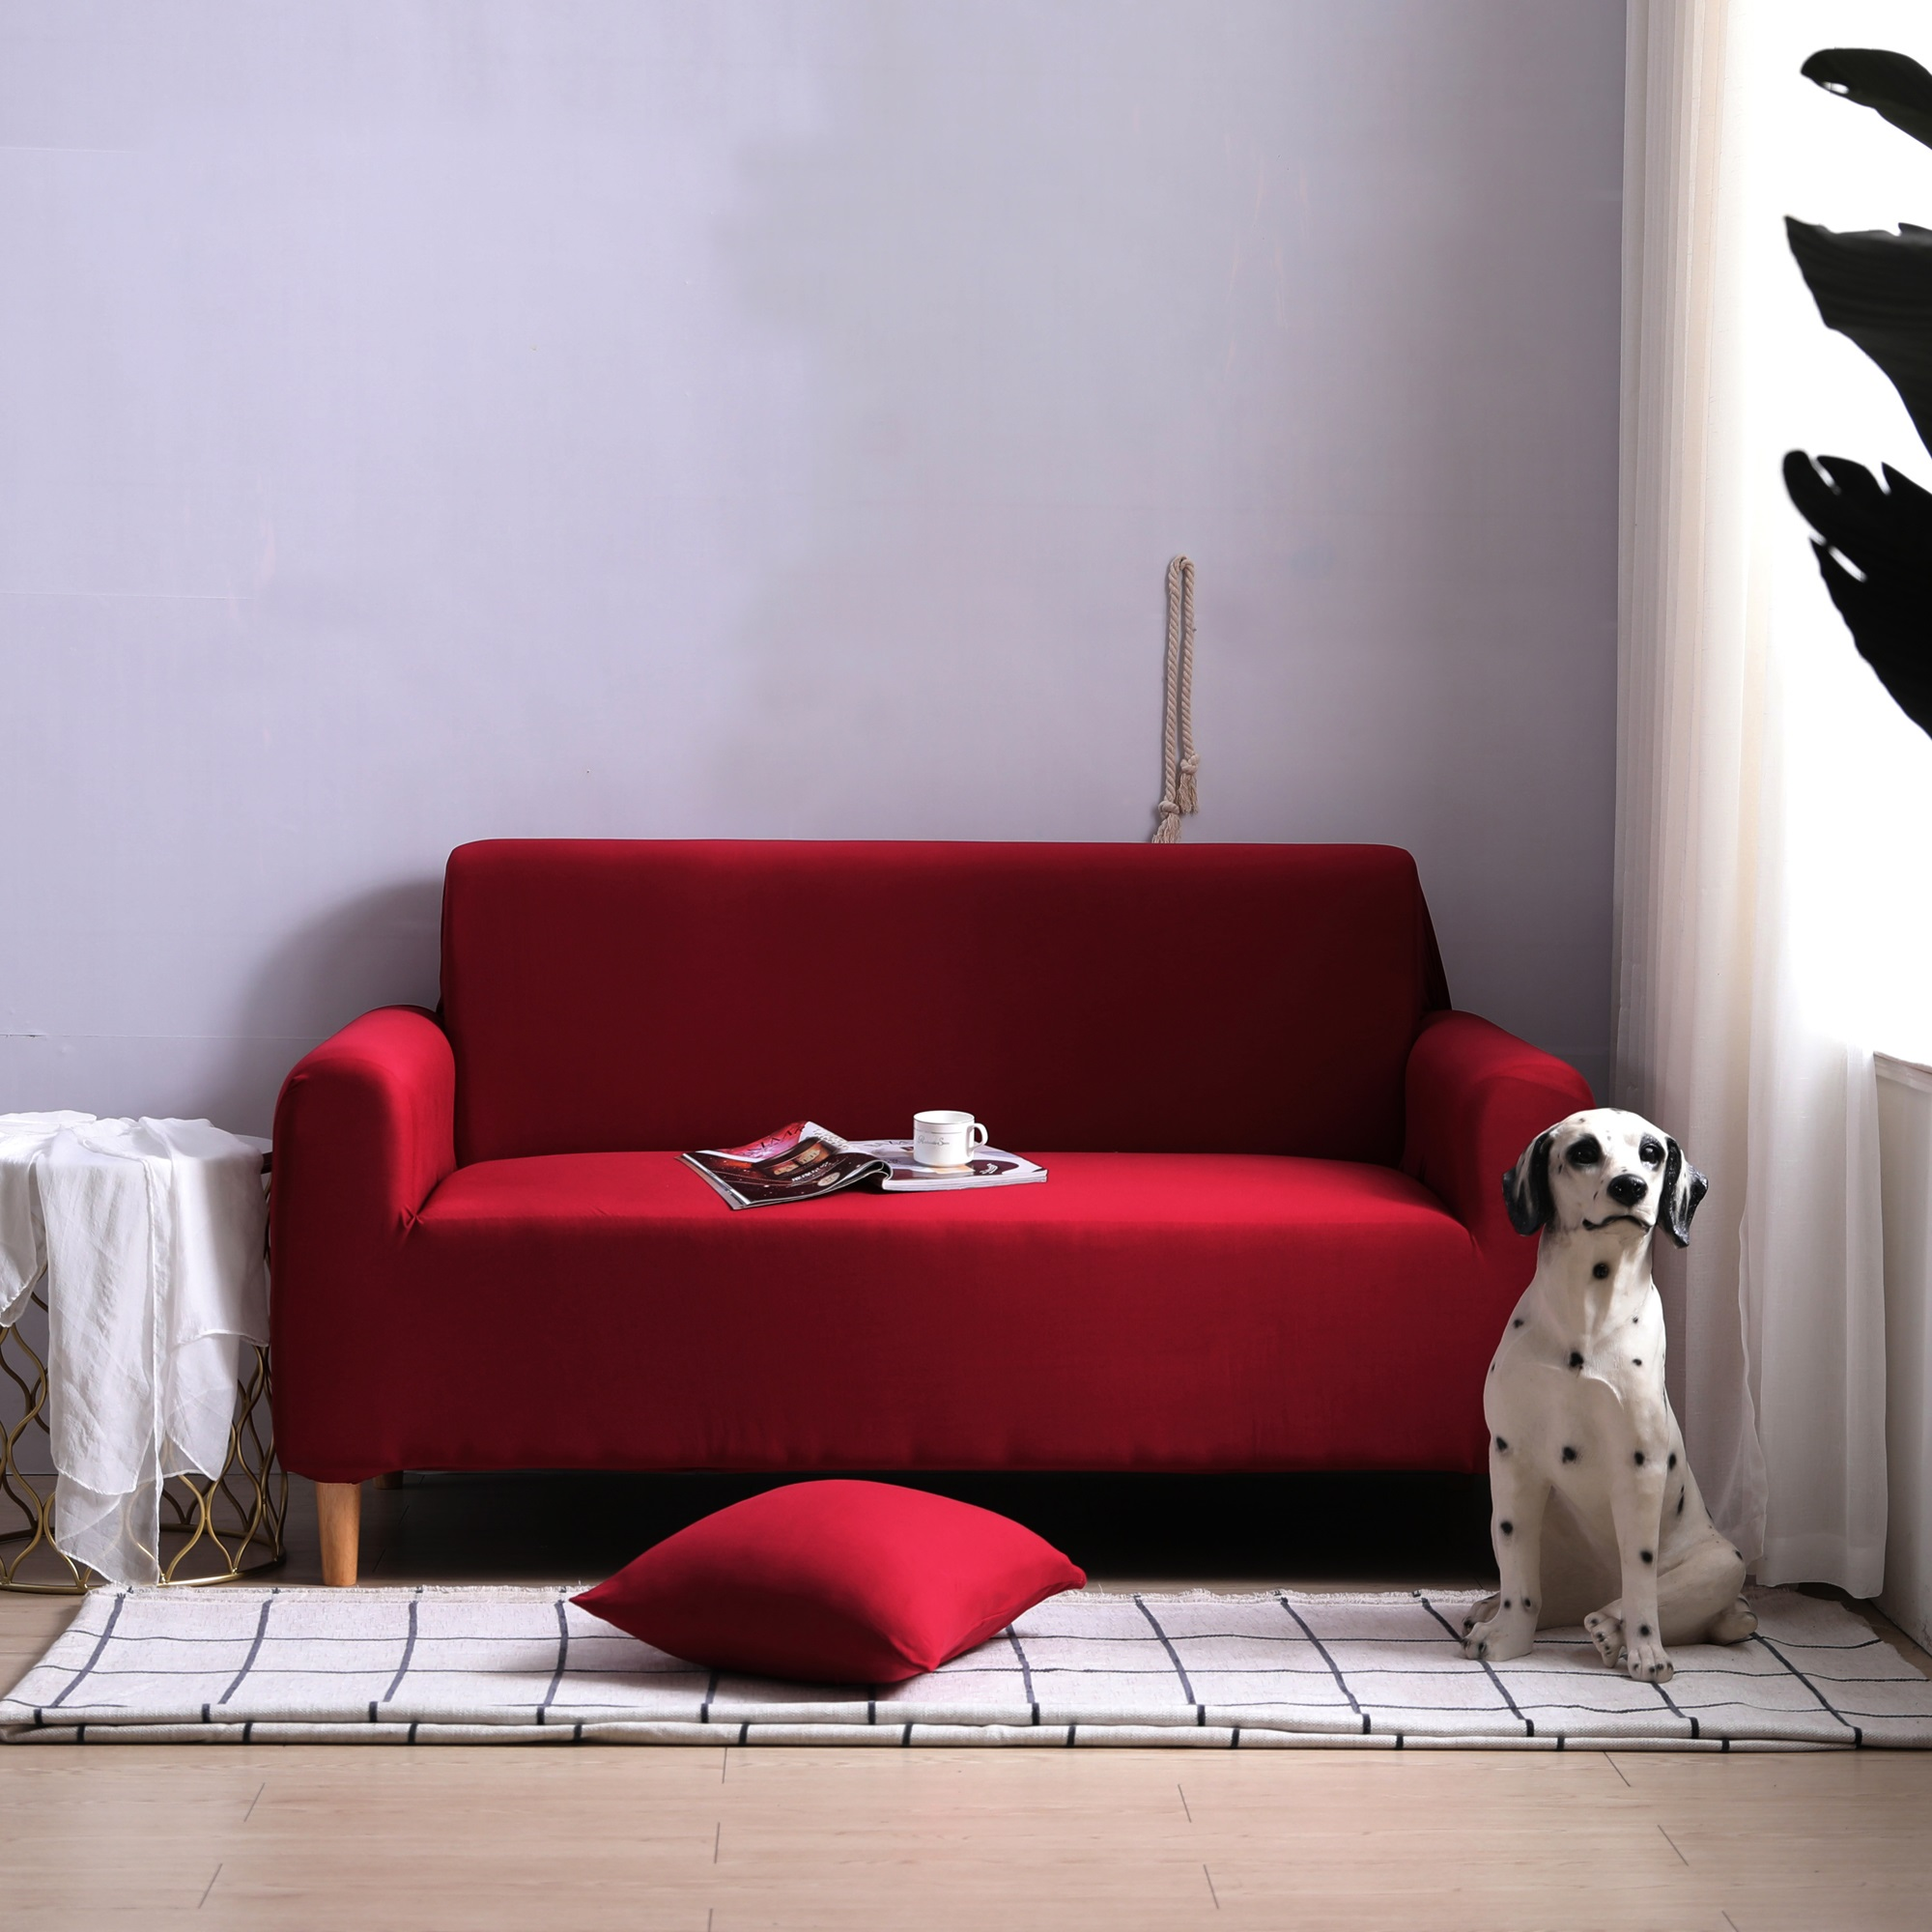 крачный чехол на диван с подушкой